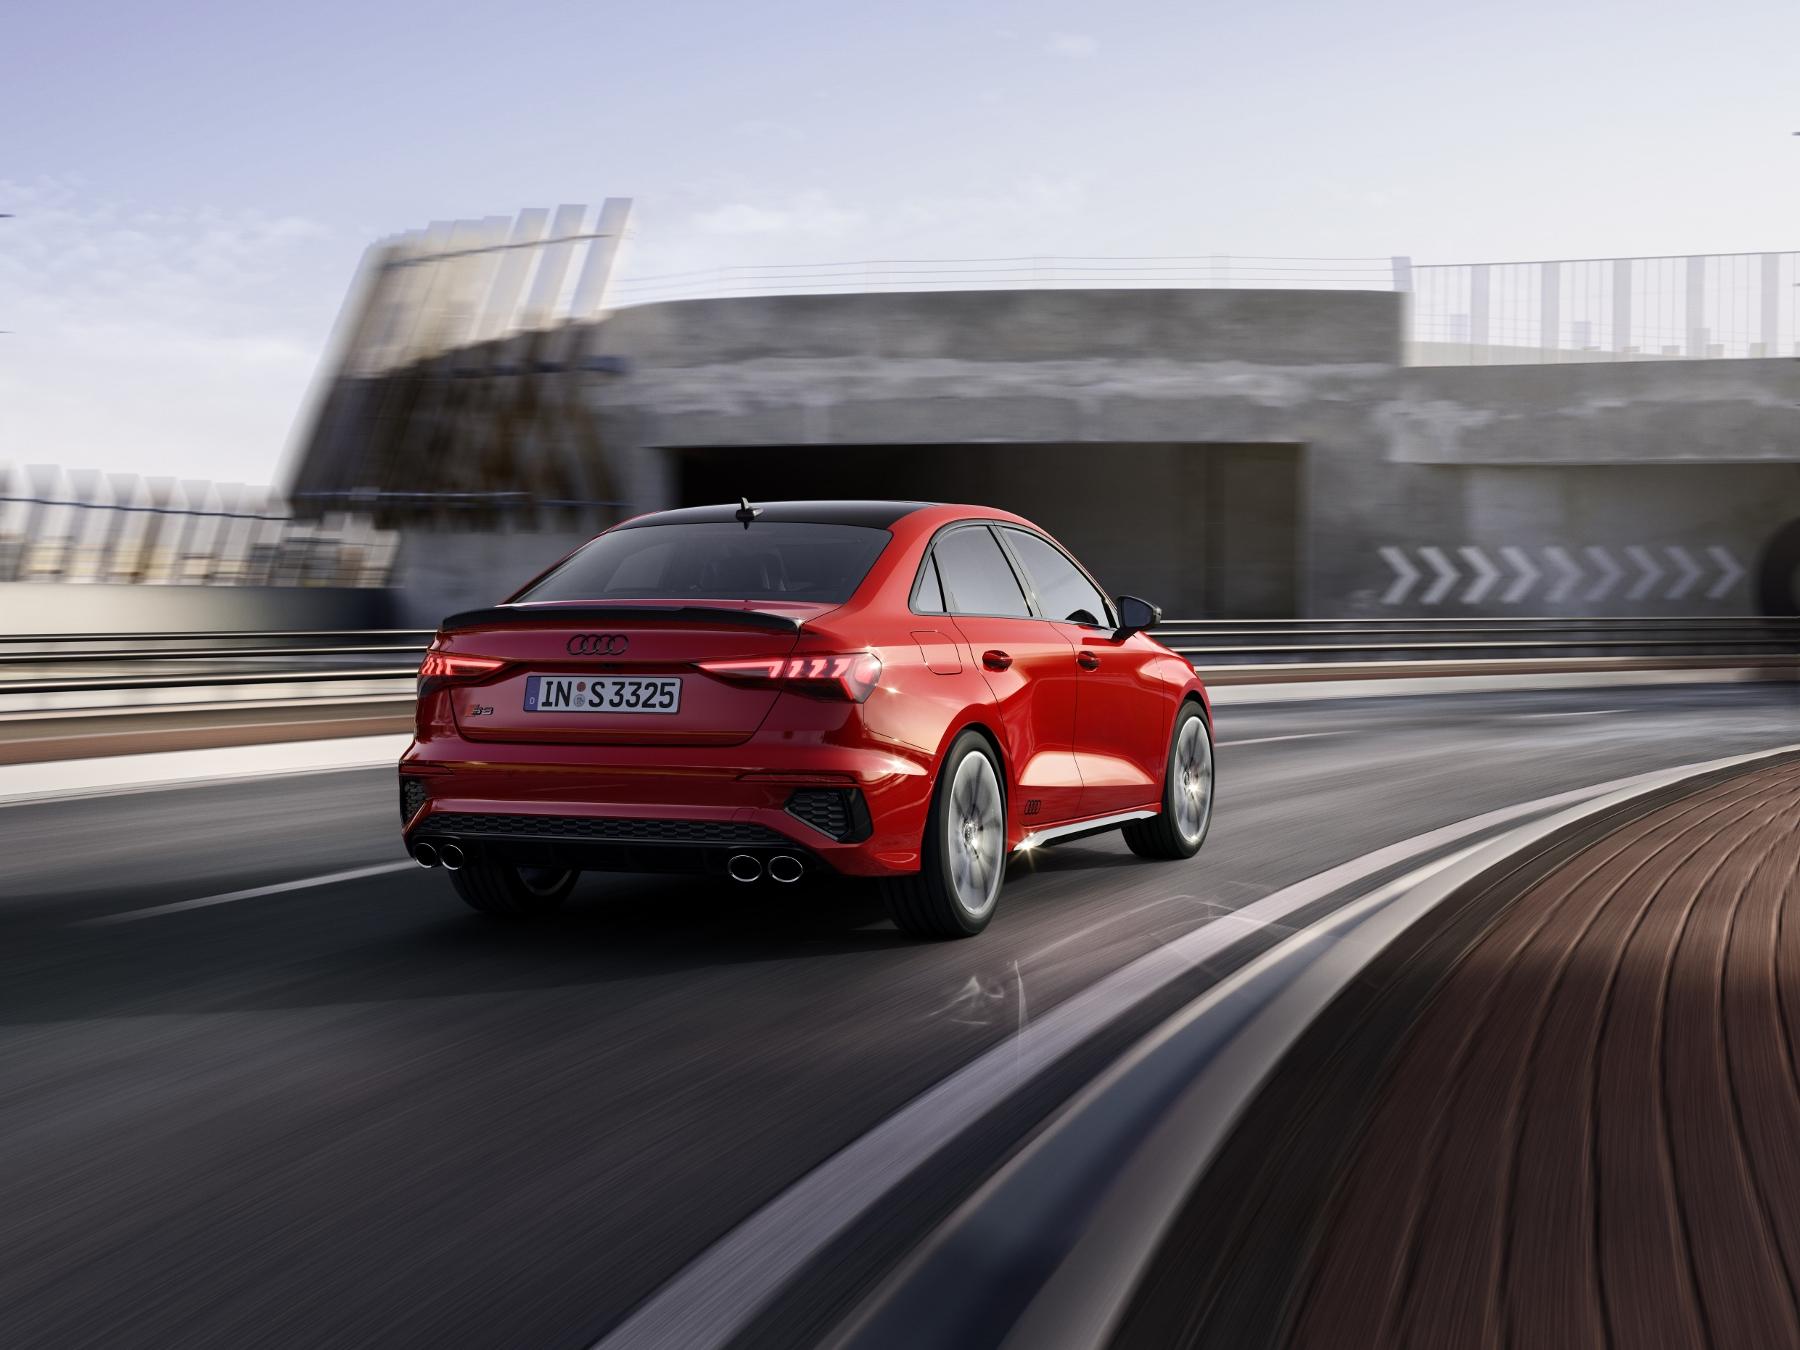 Audi ukázalo modely S3 Sedan a Sportback. Prezradilo aj nemeckú cenu ZjQDfGy2LT a204379large-1800x13